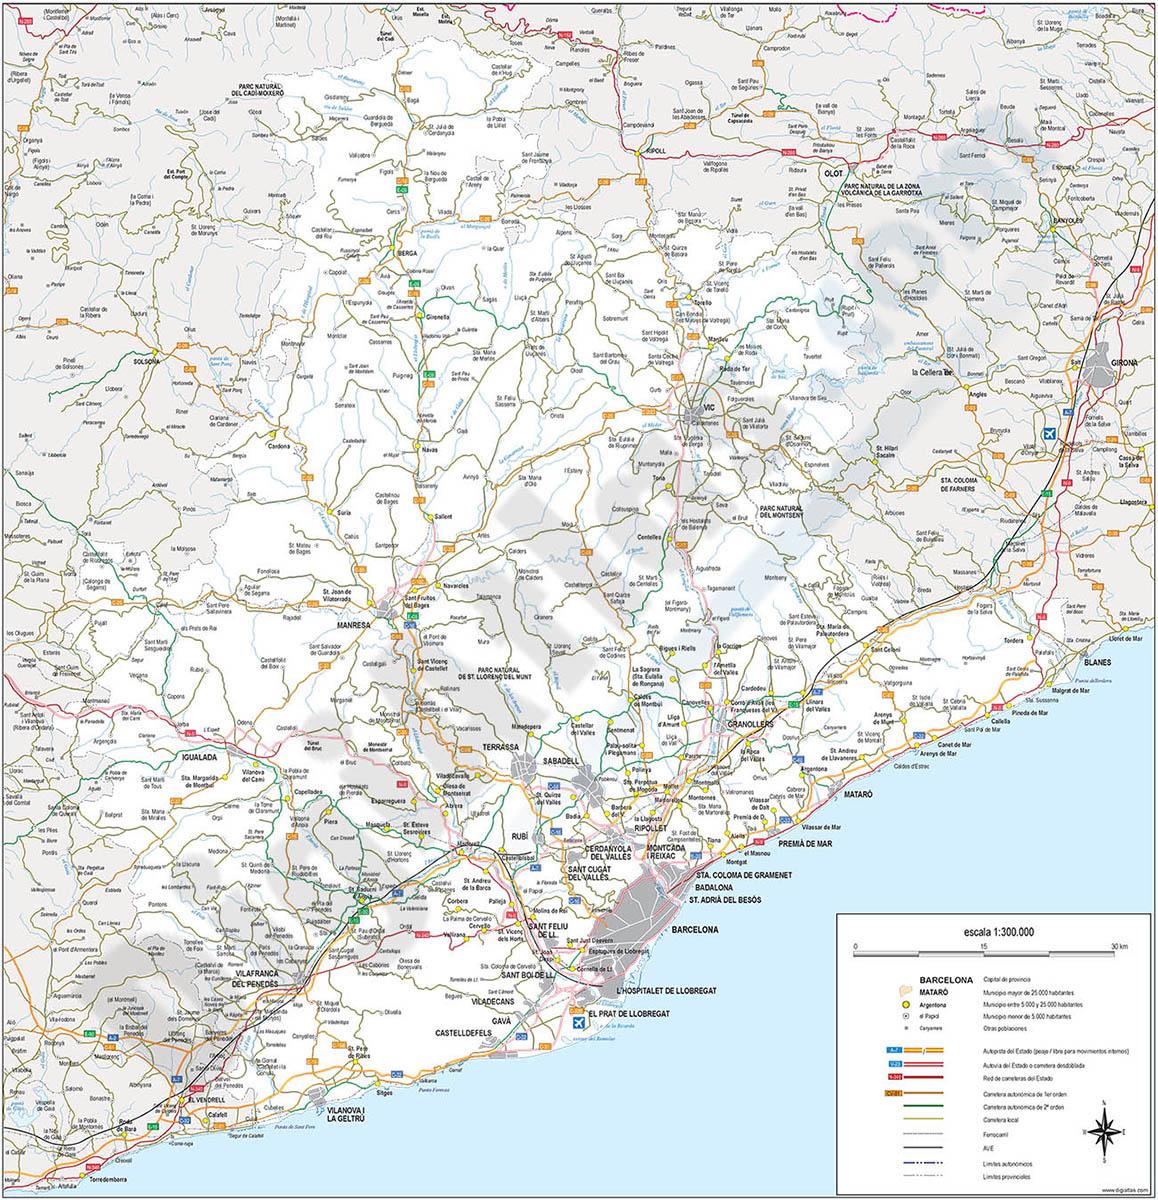 Barcelona - Mapa de la provincia